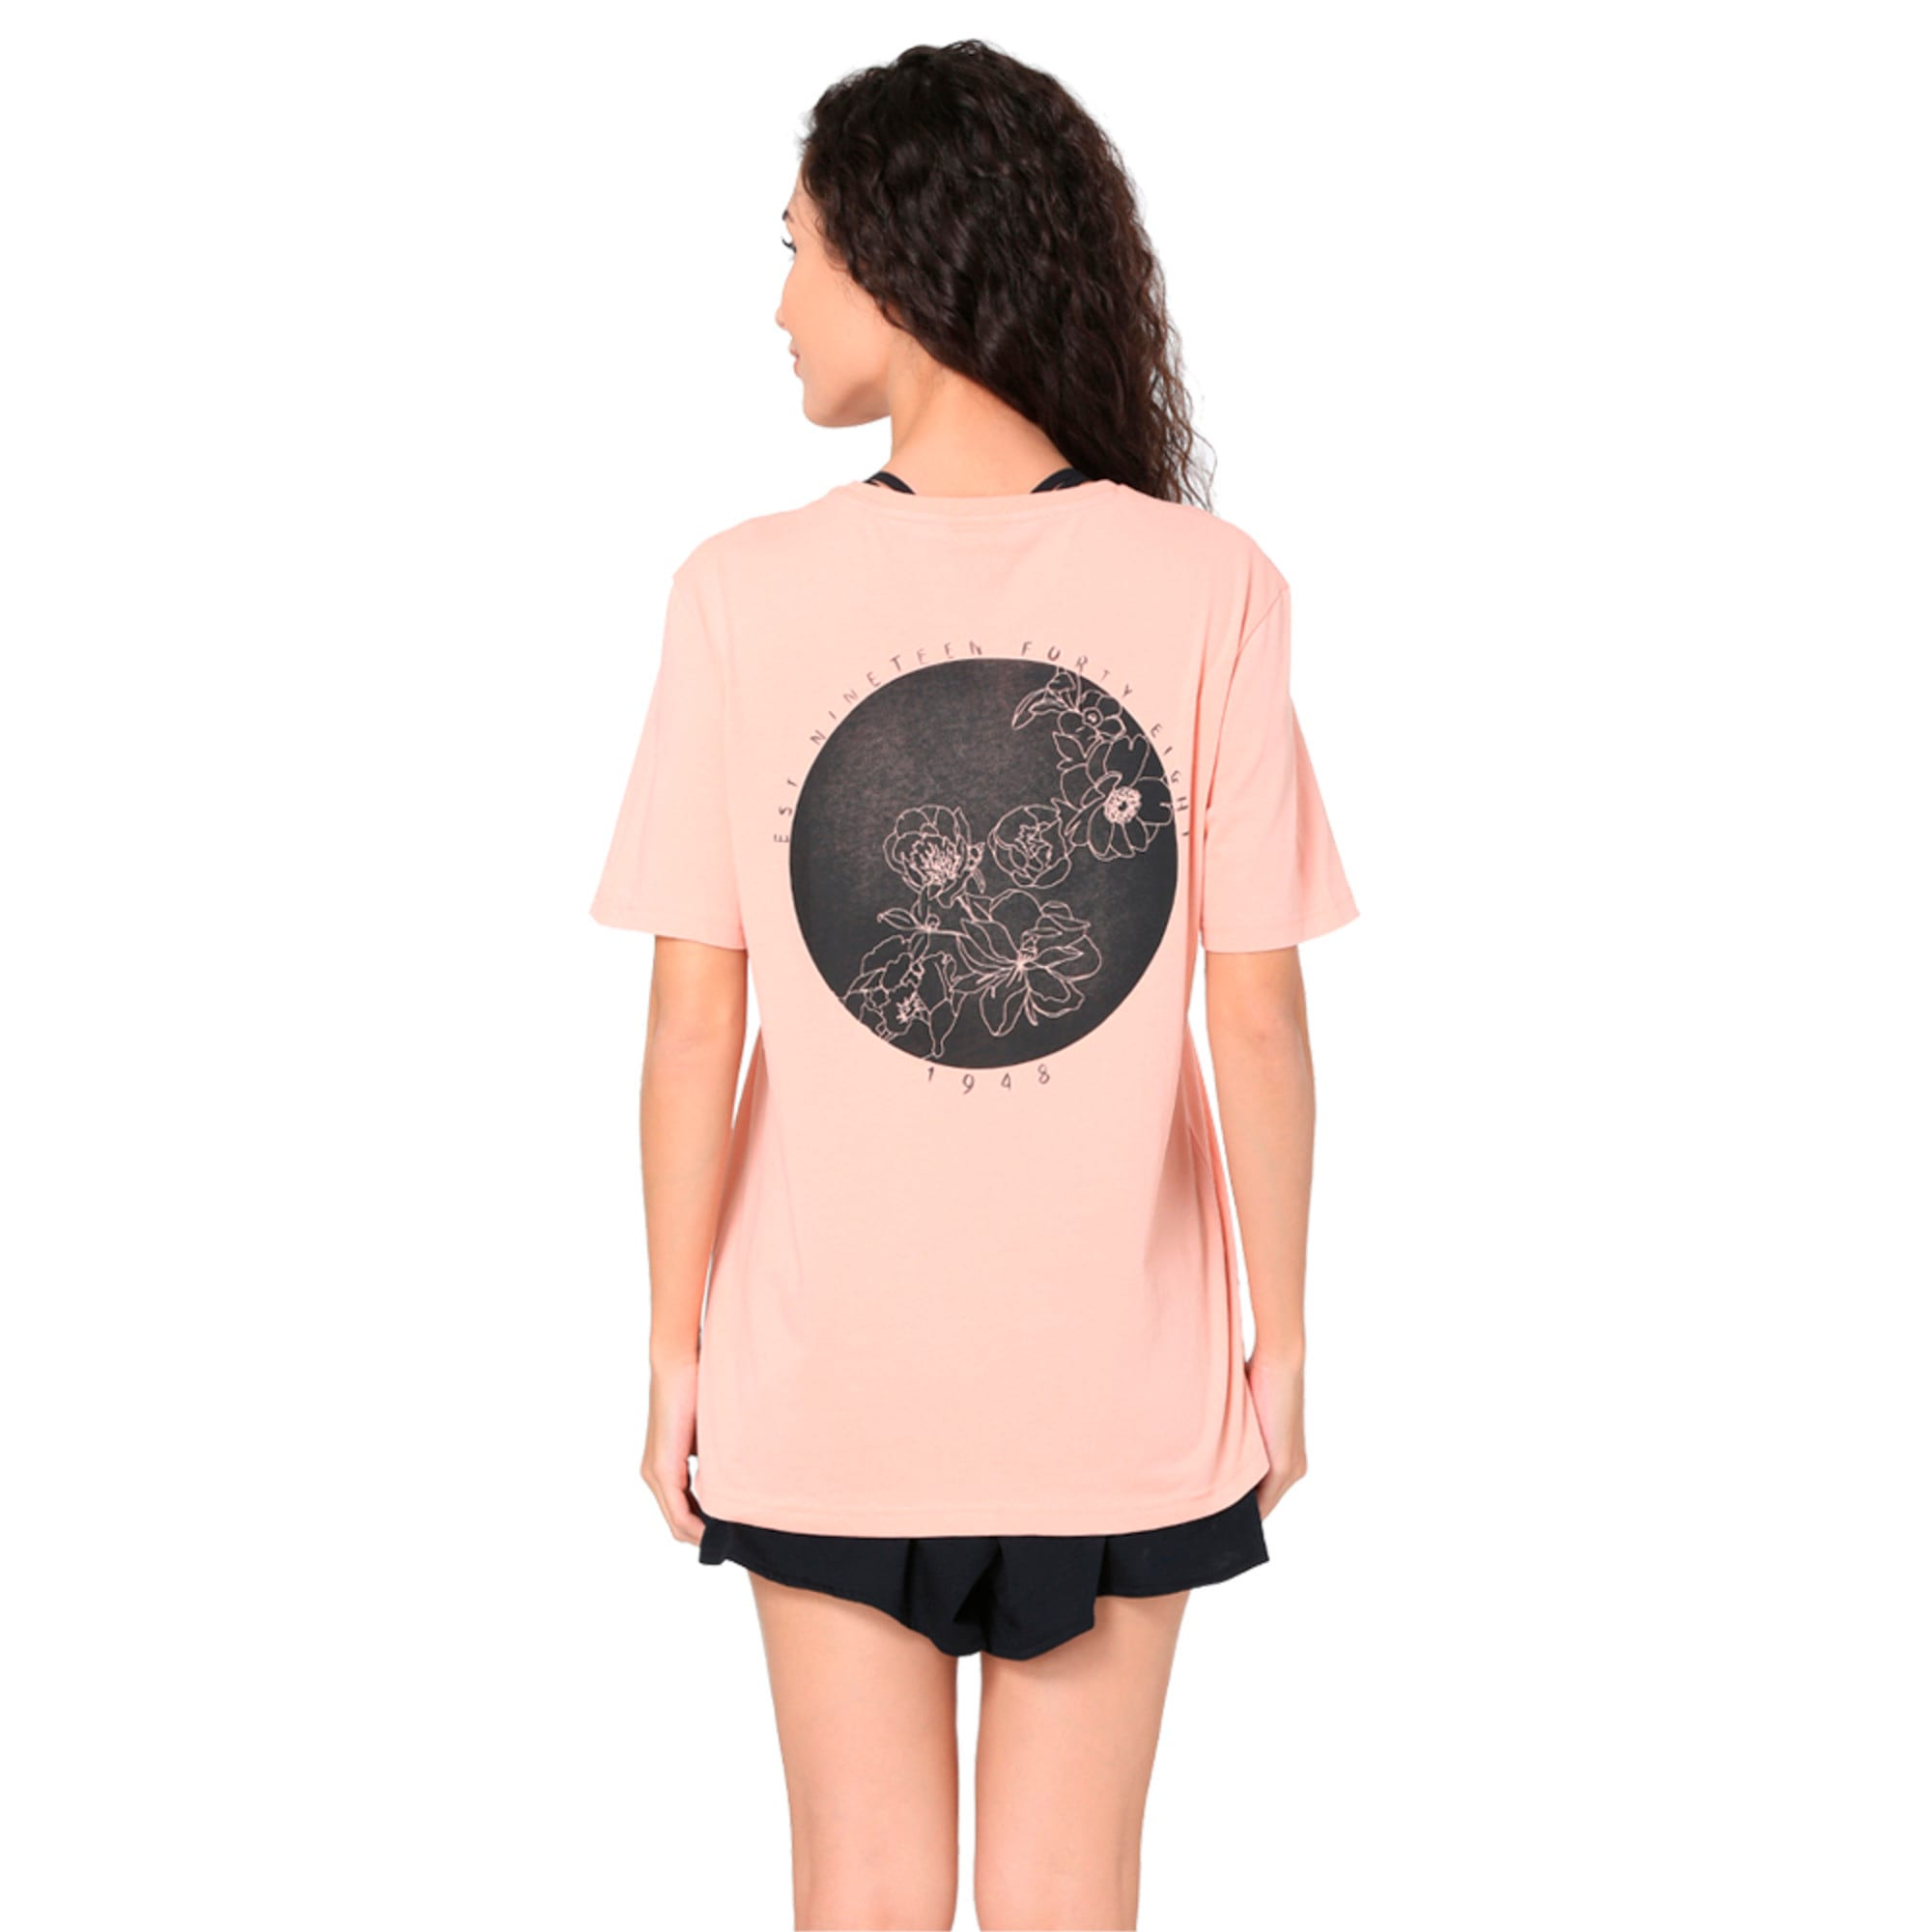 Thumbnail 3 of Women's Graphic T-shirt, Peach Beige, medium-IND